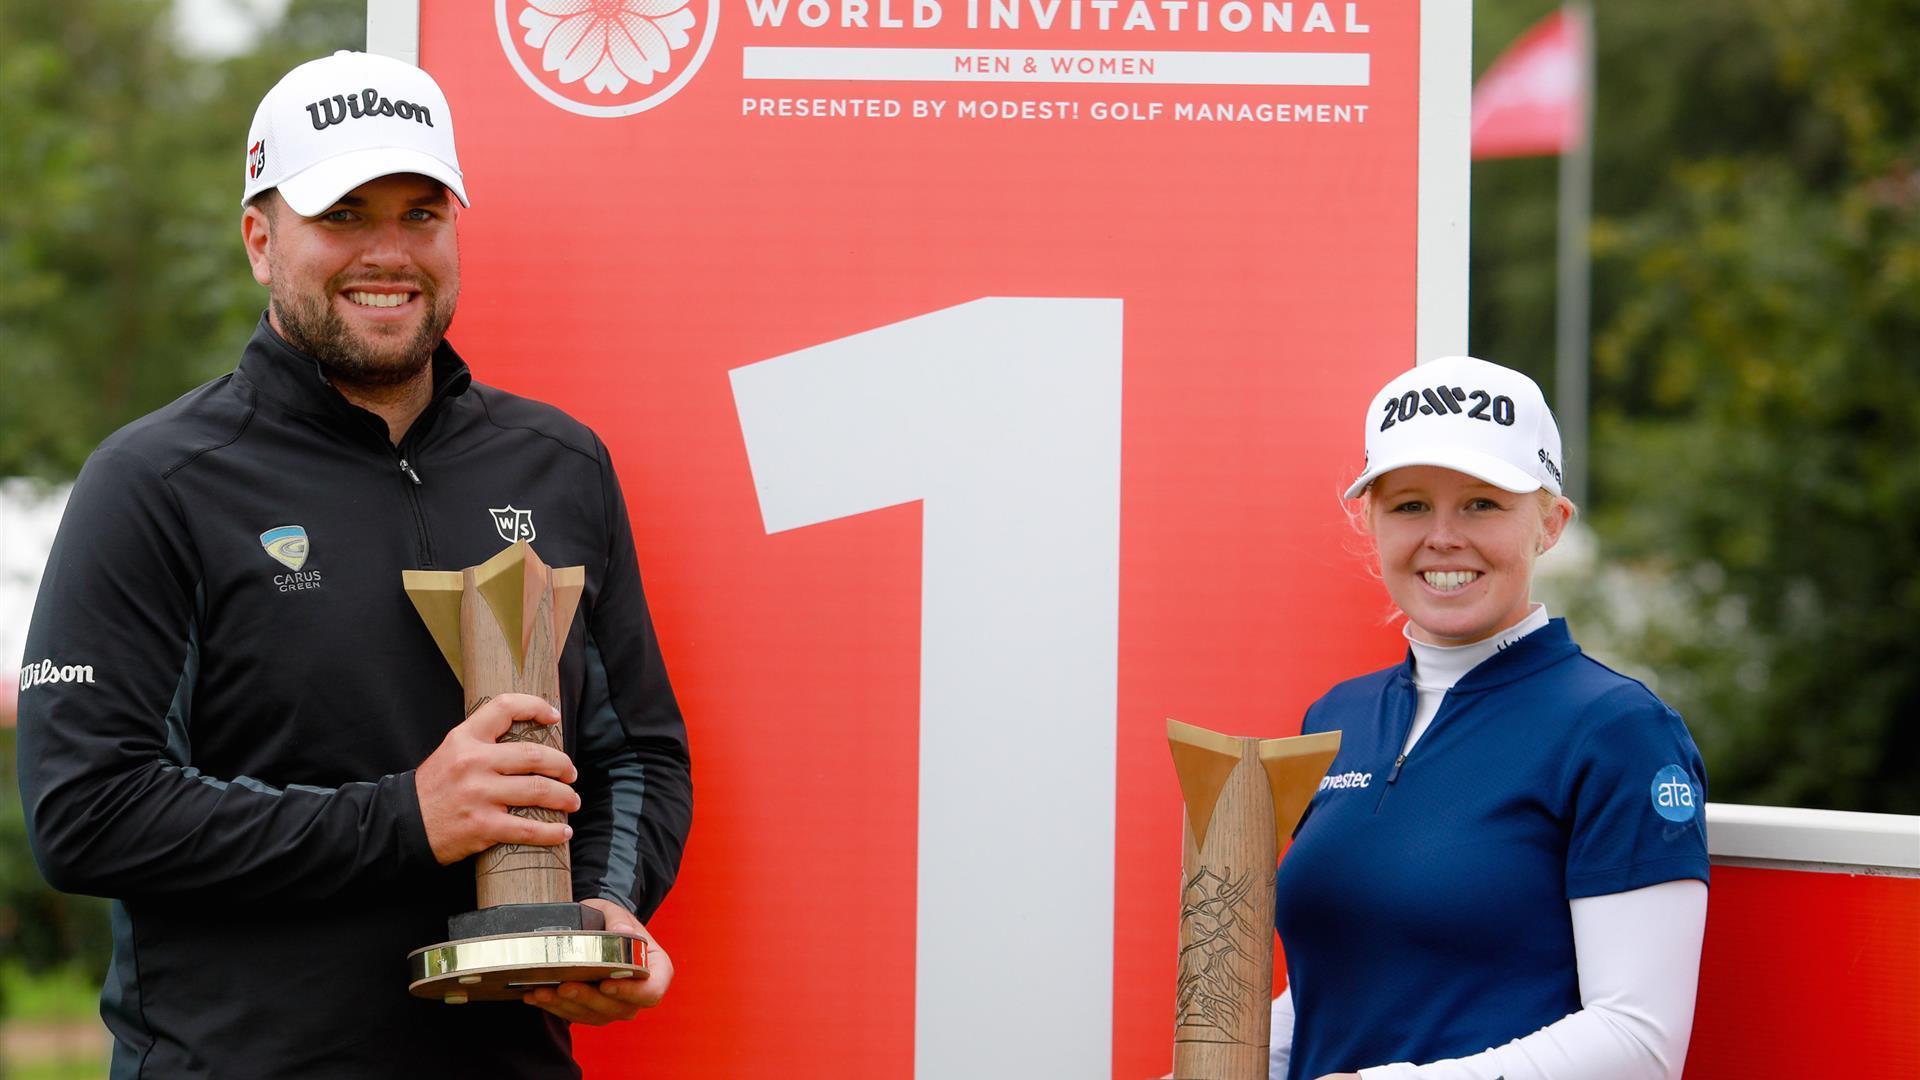 ISPS HANDA World Invitational Presented by Modest! Golf Management